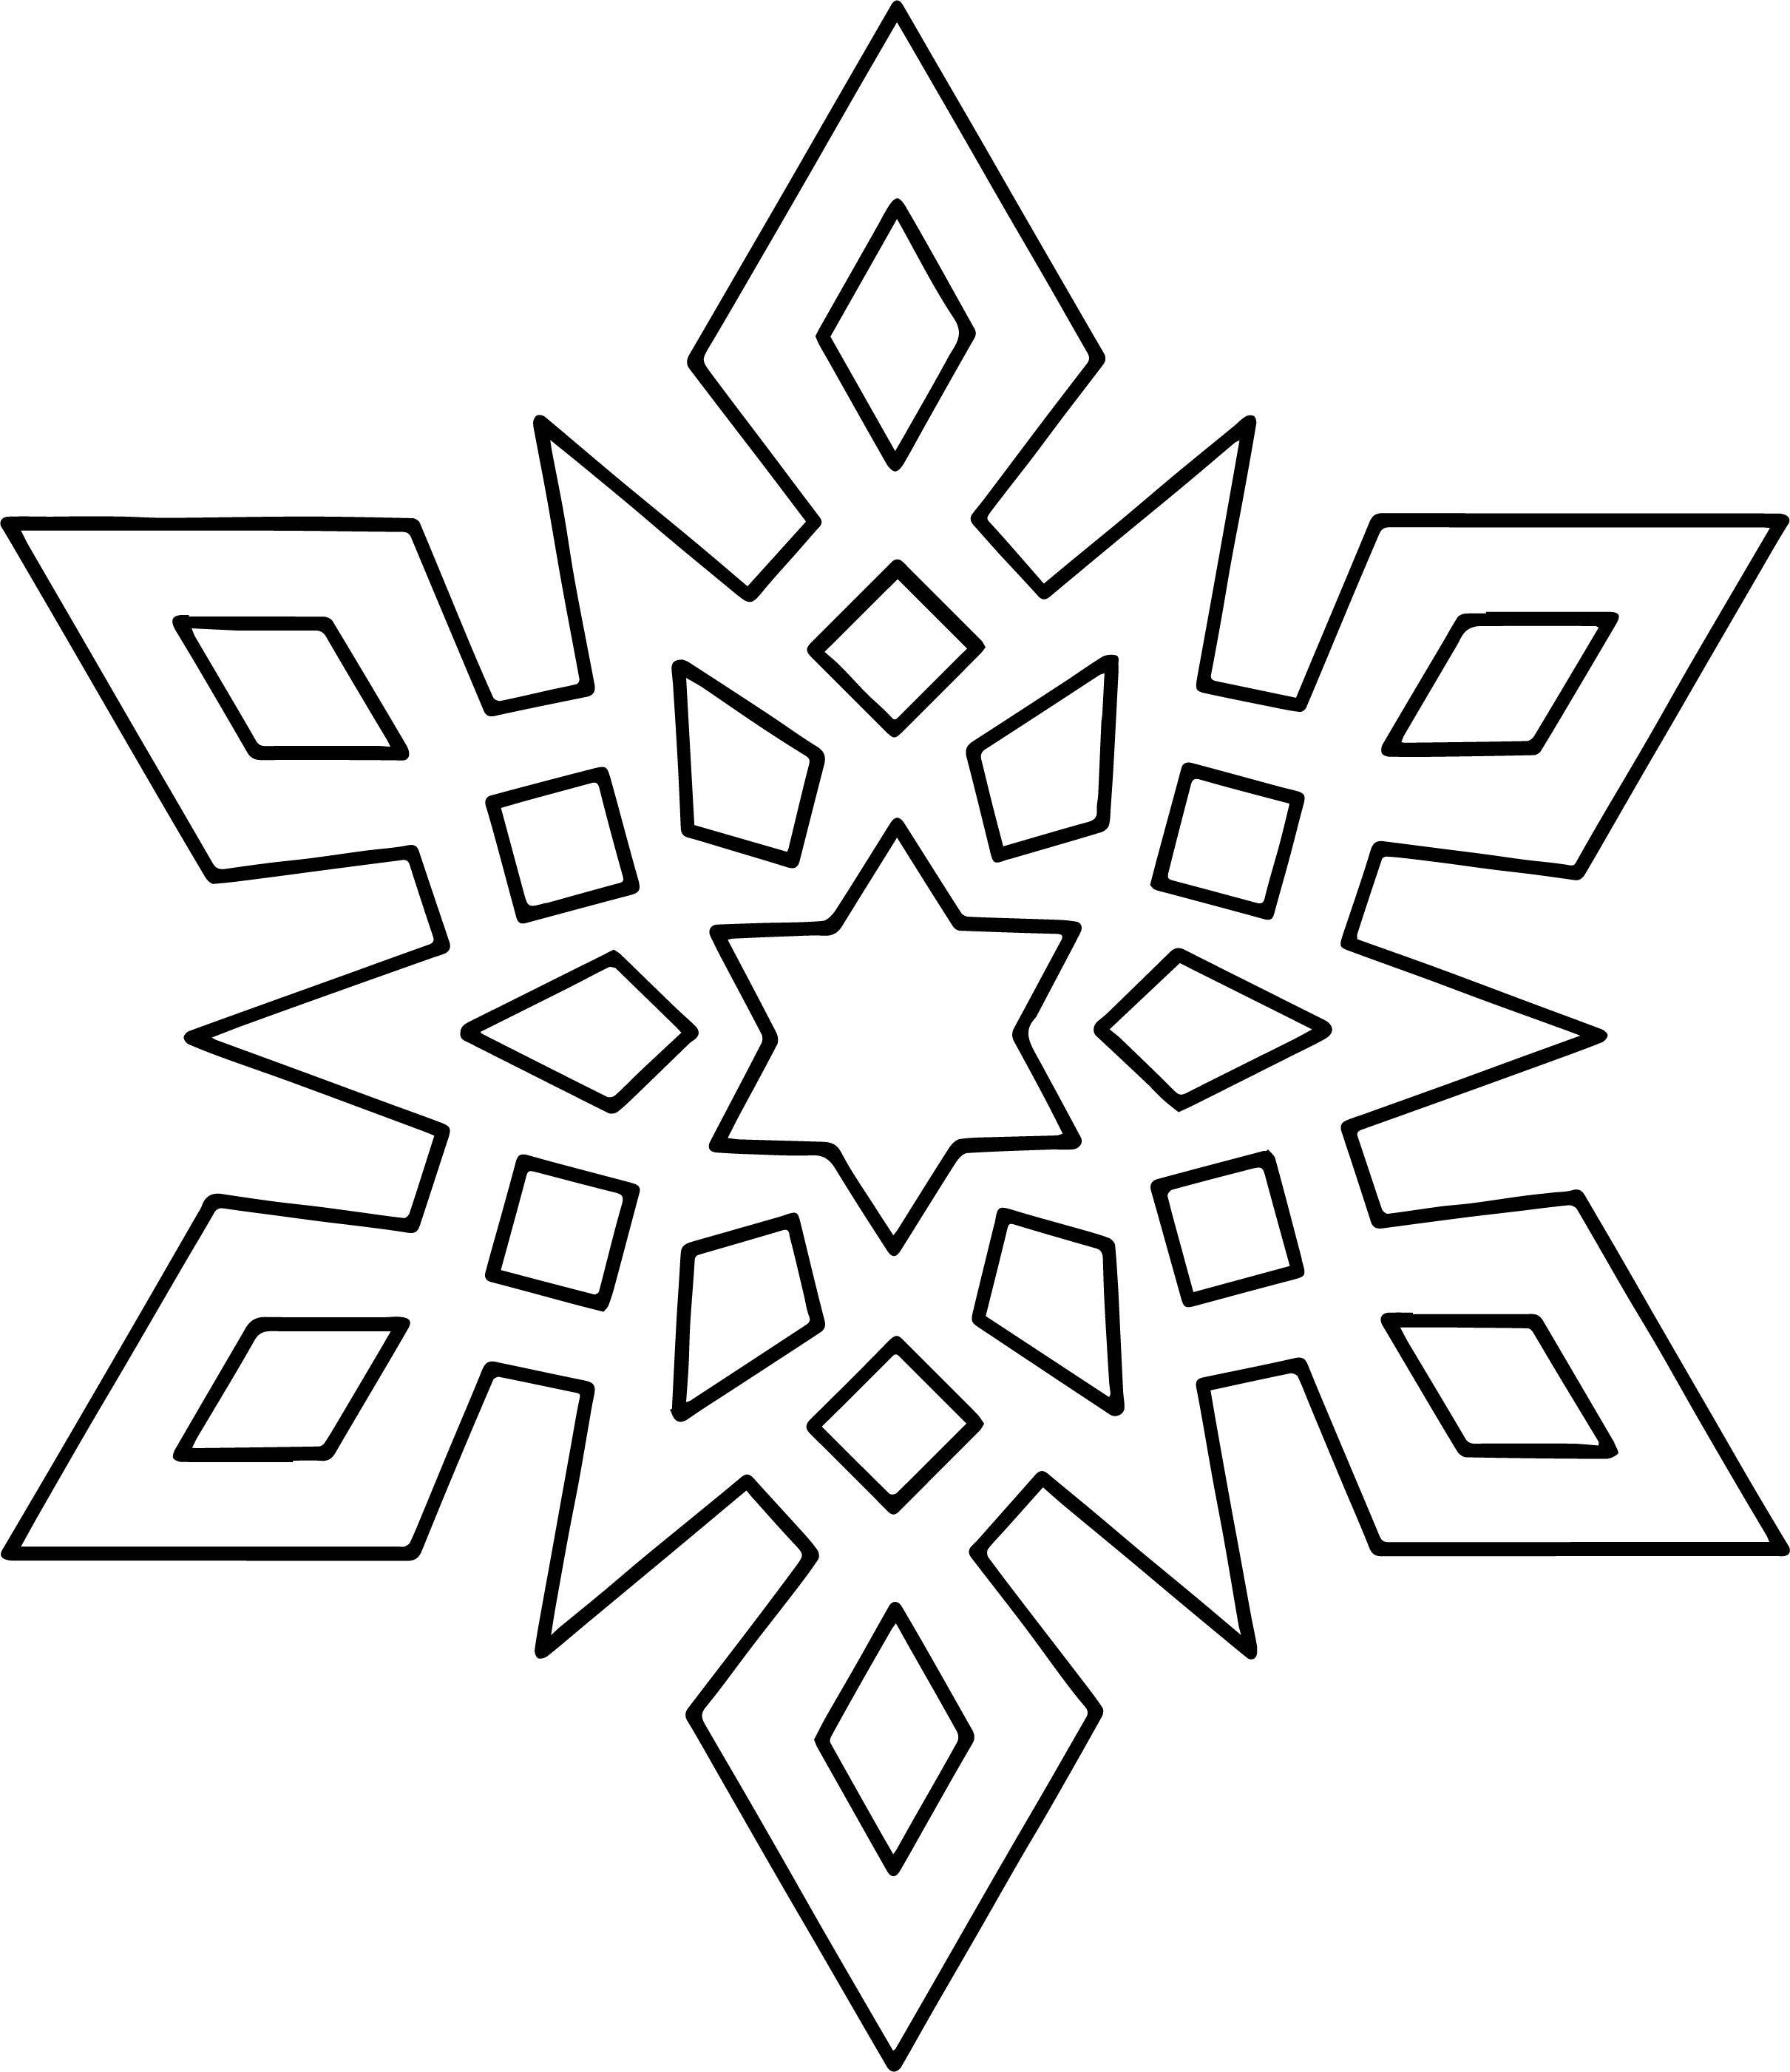 Nice Crystal Snowflake Coloring Page Snowflake Coloring Pages Mandala Coloring Pages Christmas Coloring Pages